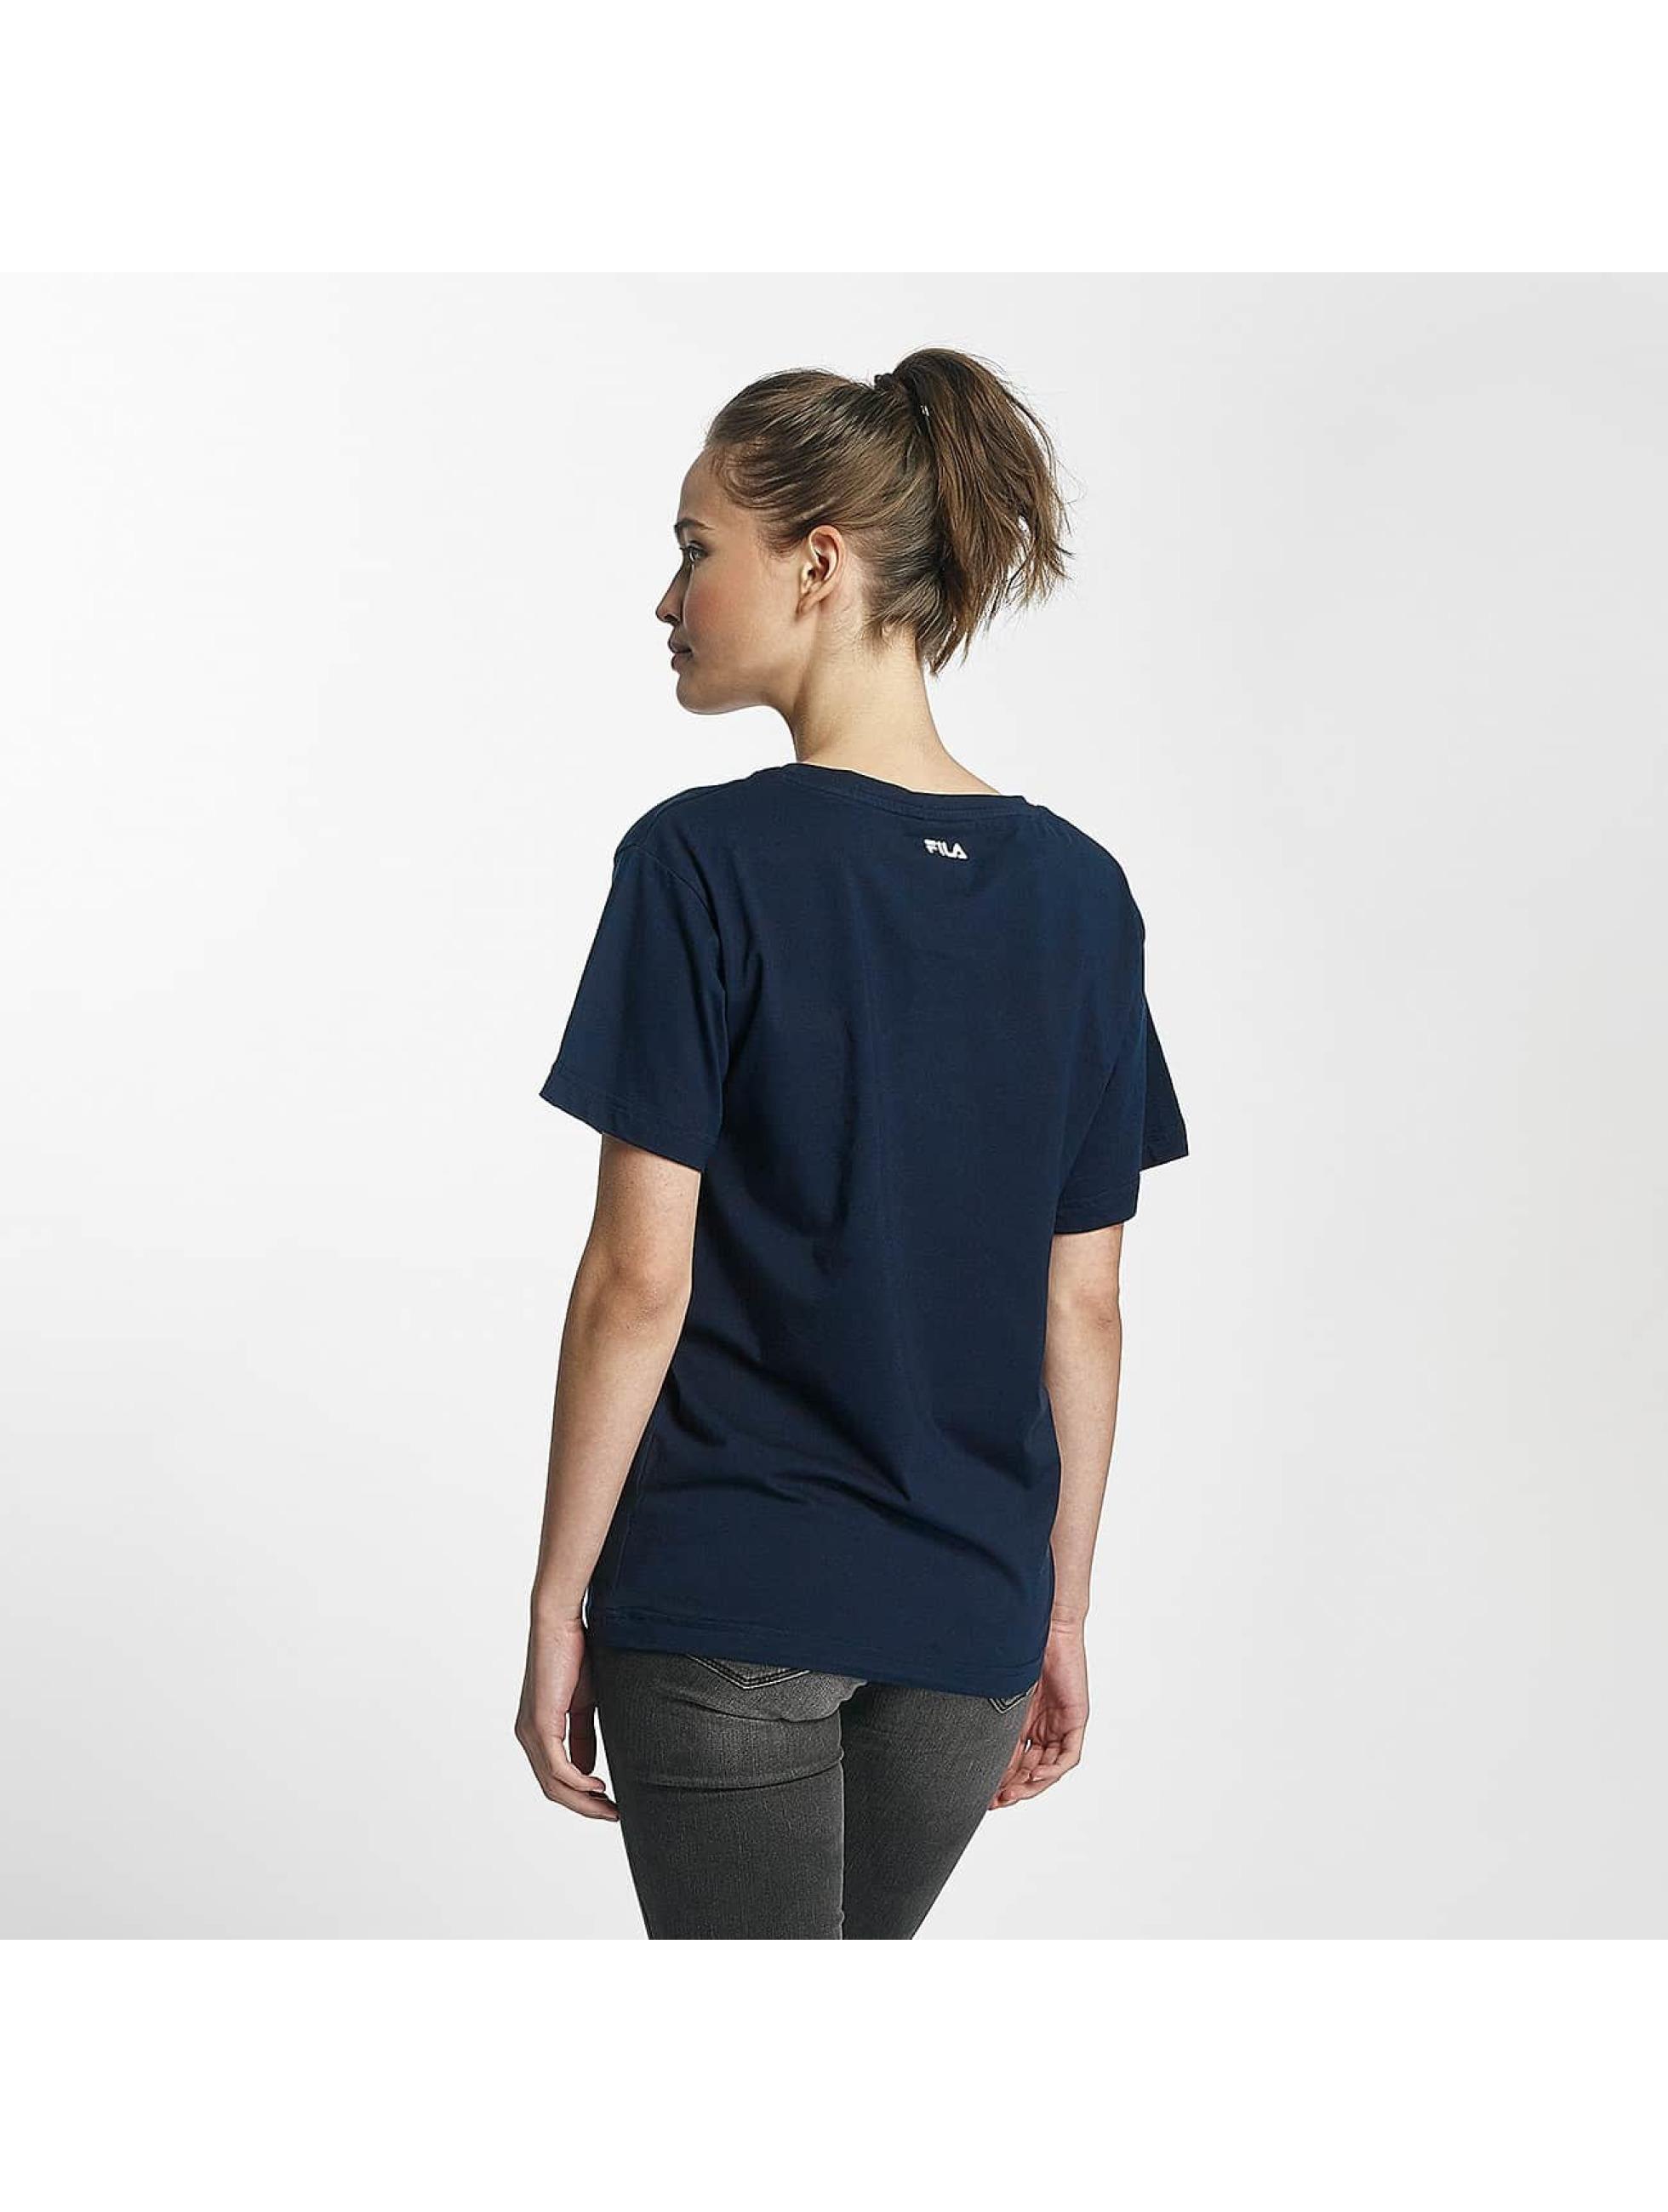 fila core line classic bleu femme t shirt fila acheter pas cher haut 439363. Black Bedroom Furniture Sets. Home Design Ideas